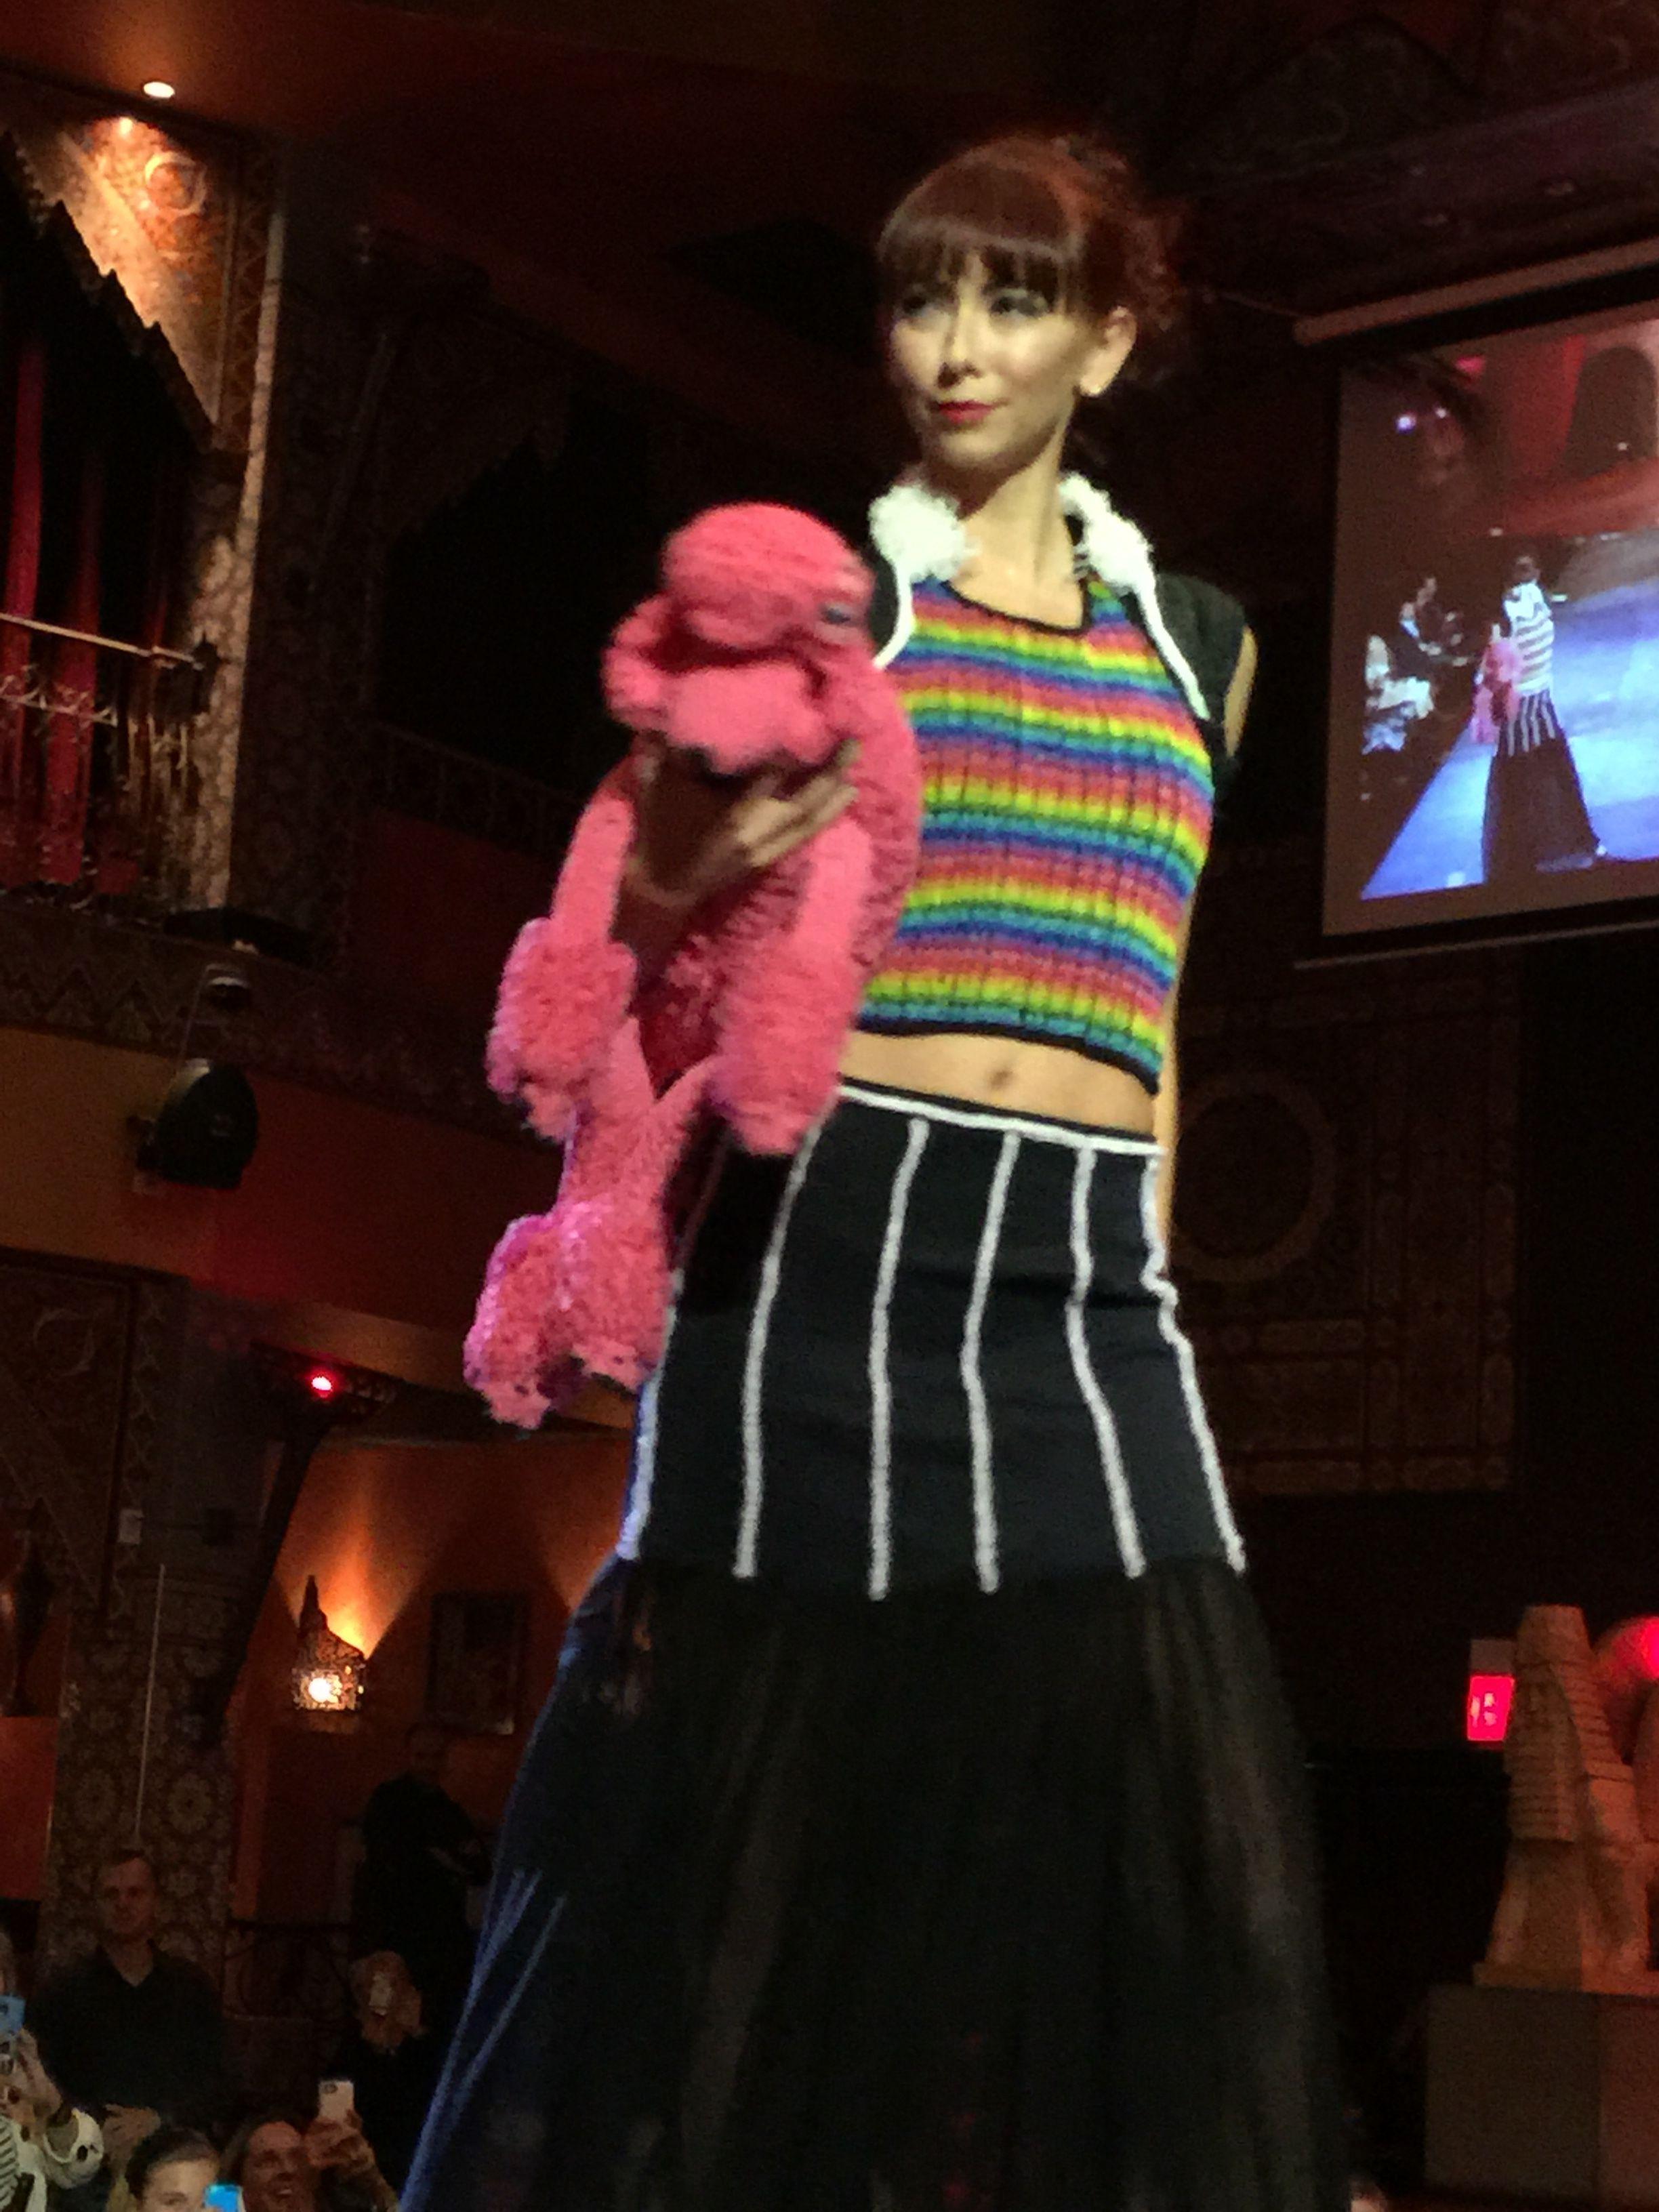 Rainbow loom dress barbie for her wedding